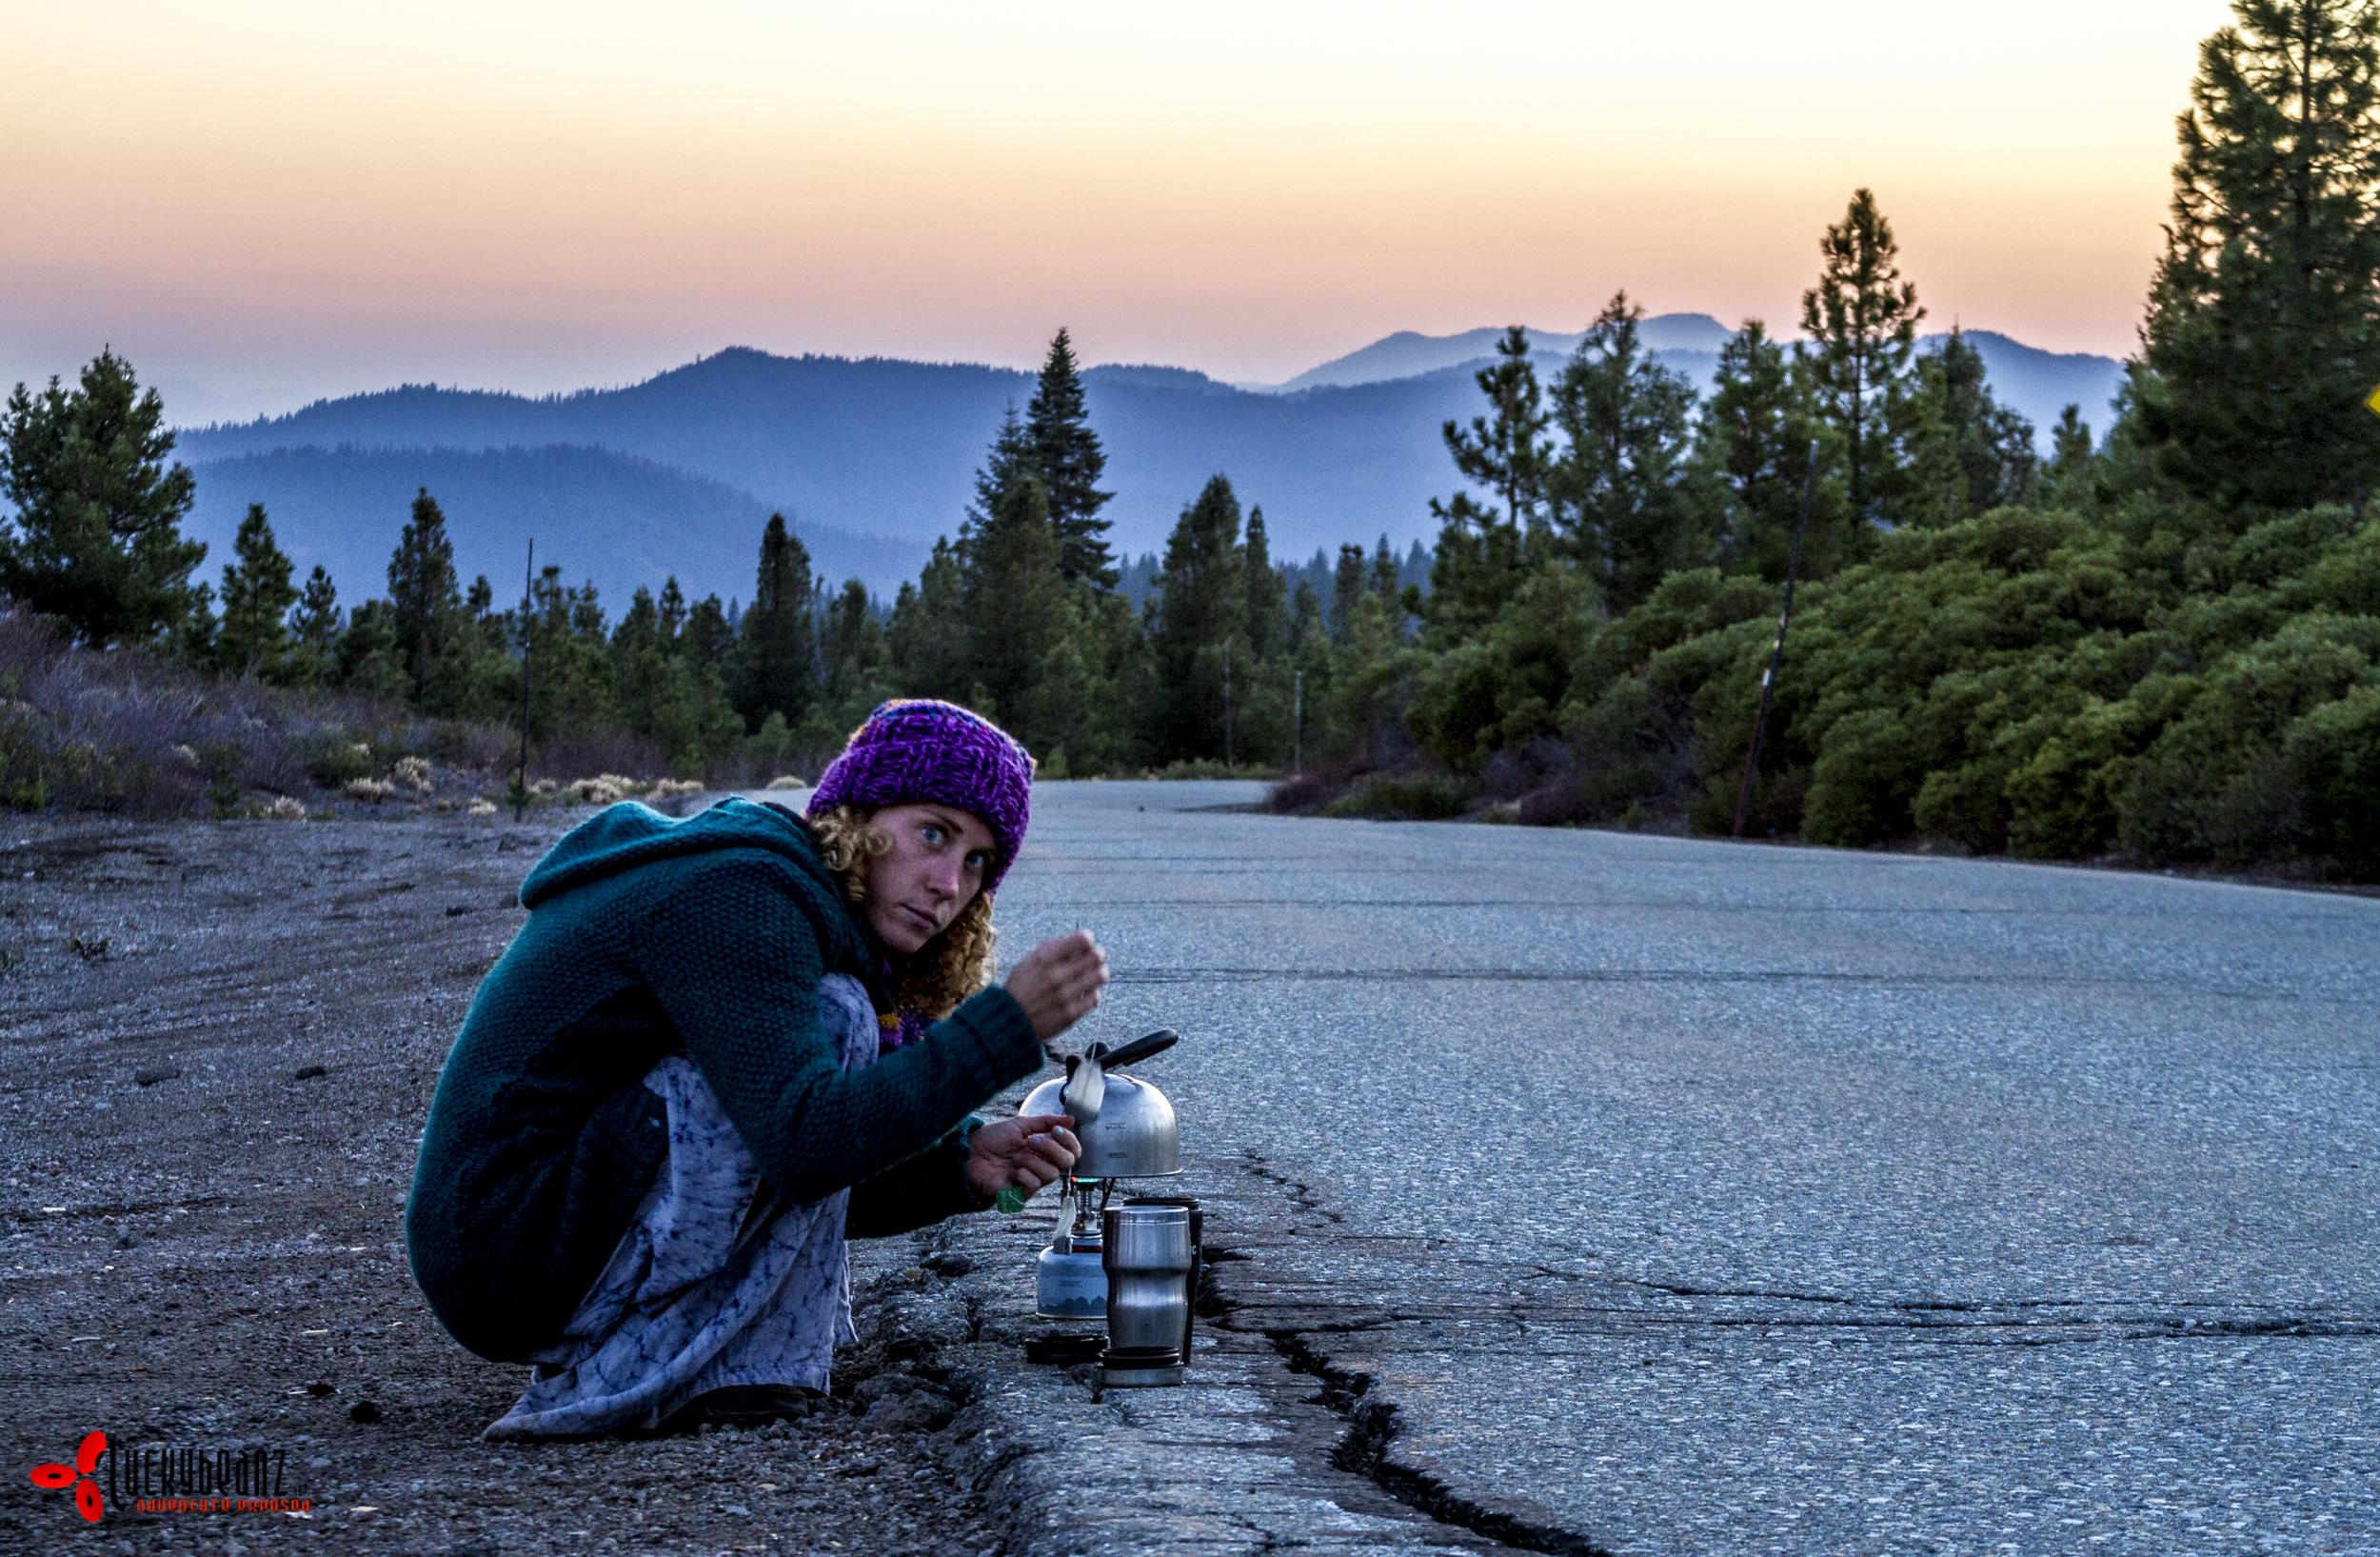 Making tea on the road.